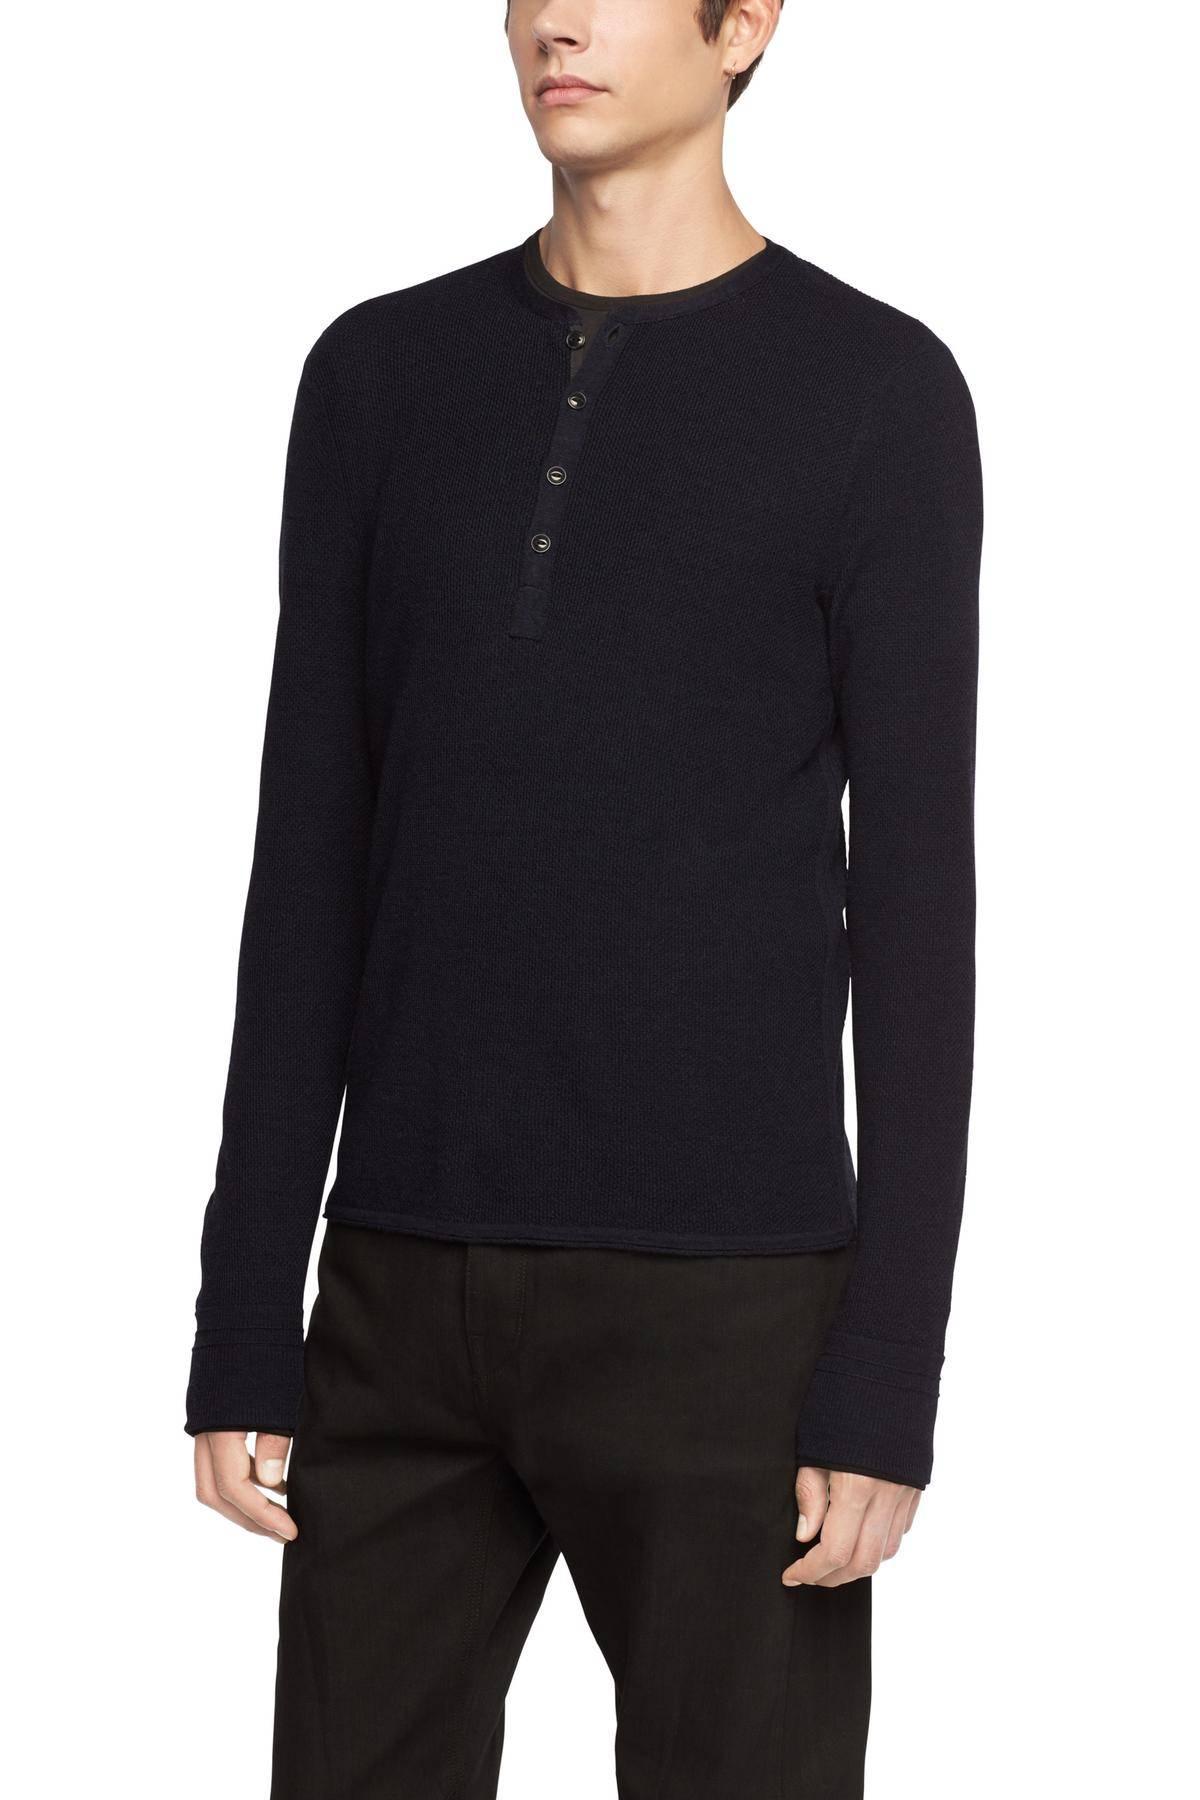 MSRP $250 RAG /& BONE Mens Giles Henley Cotton Cashmere Pullover Burgundy